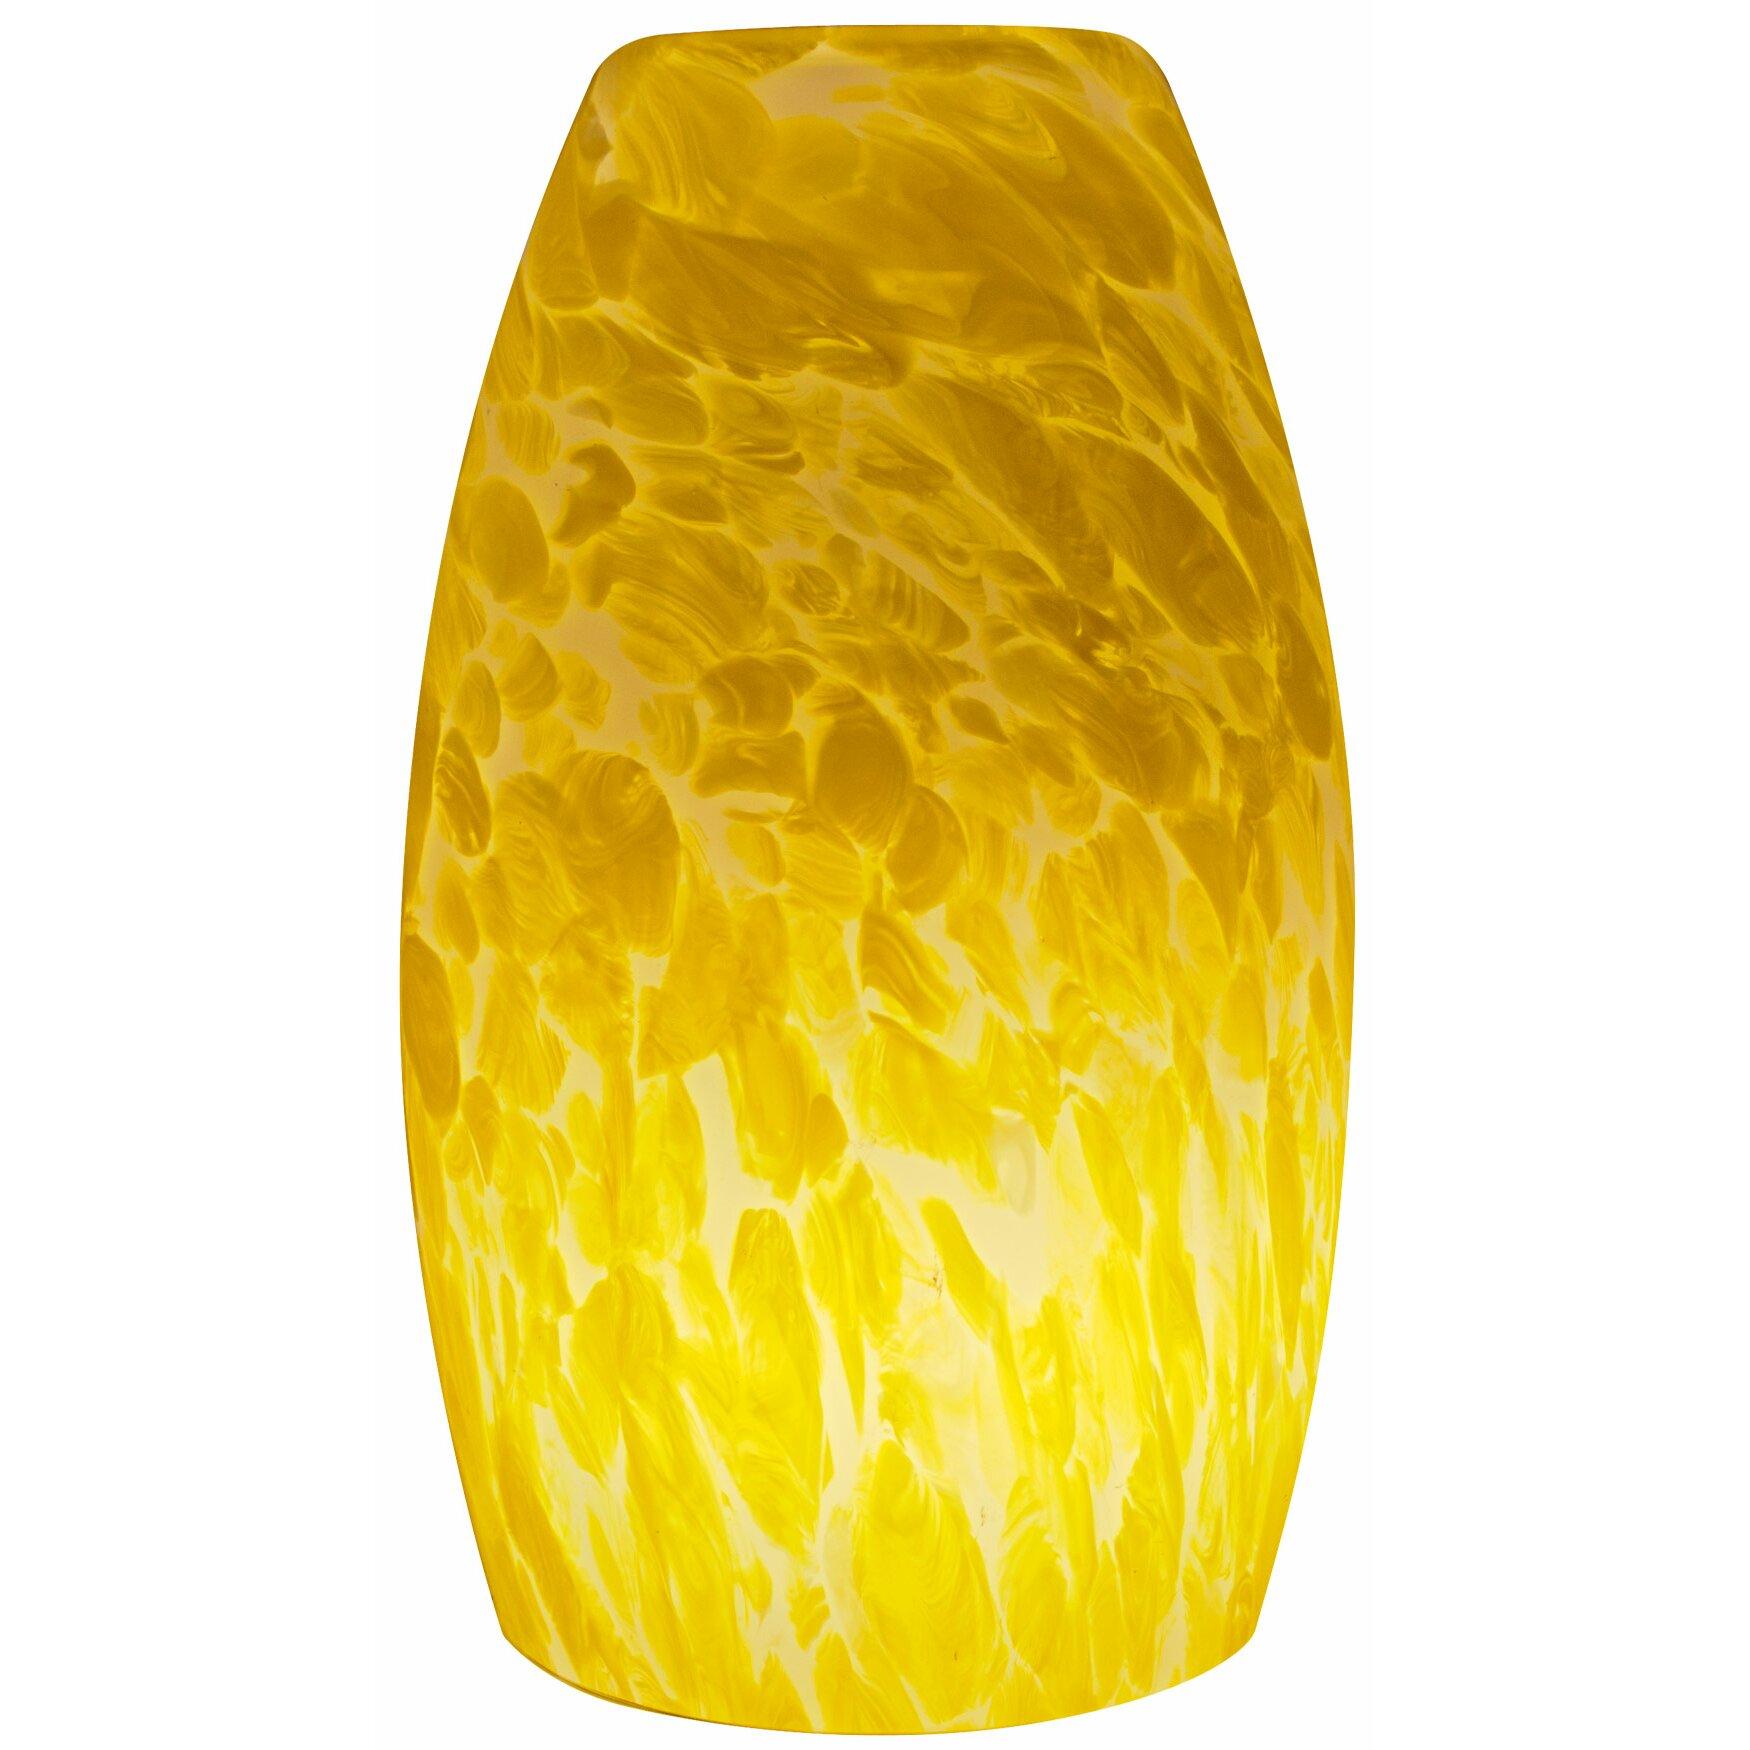 American Lighting LLC Glass Oval Pendant Shade Reviews Way